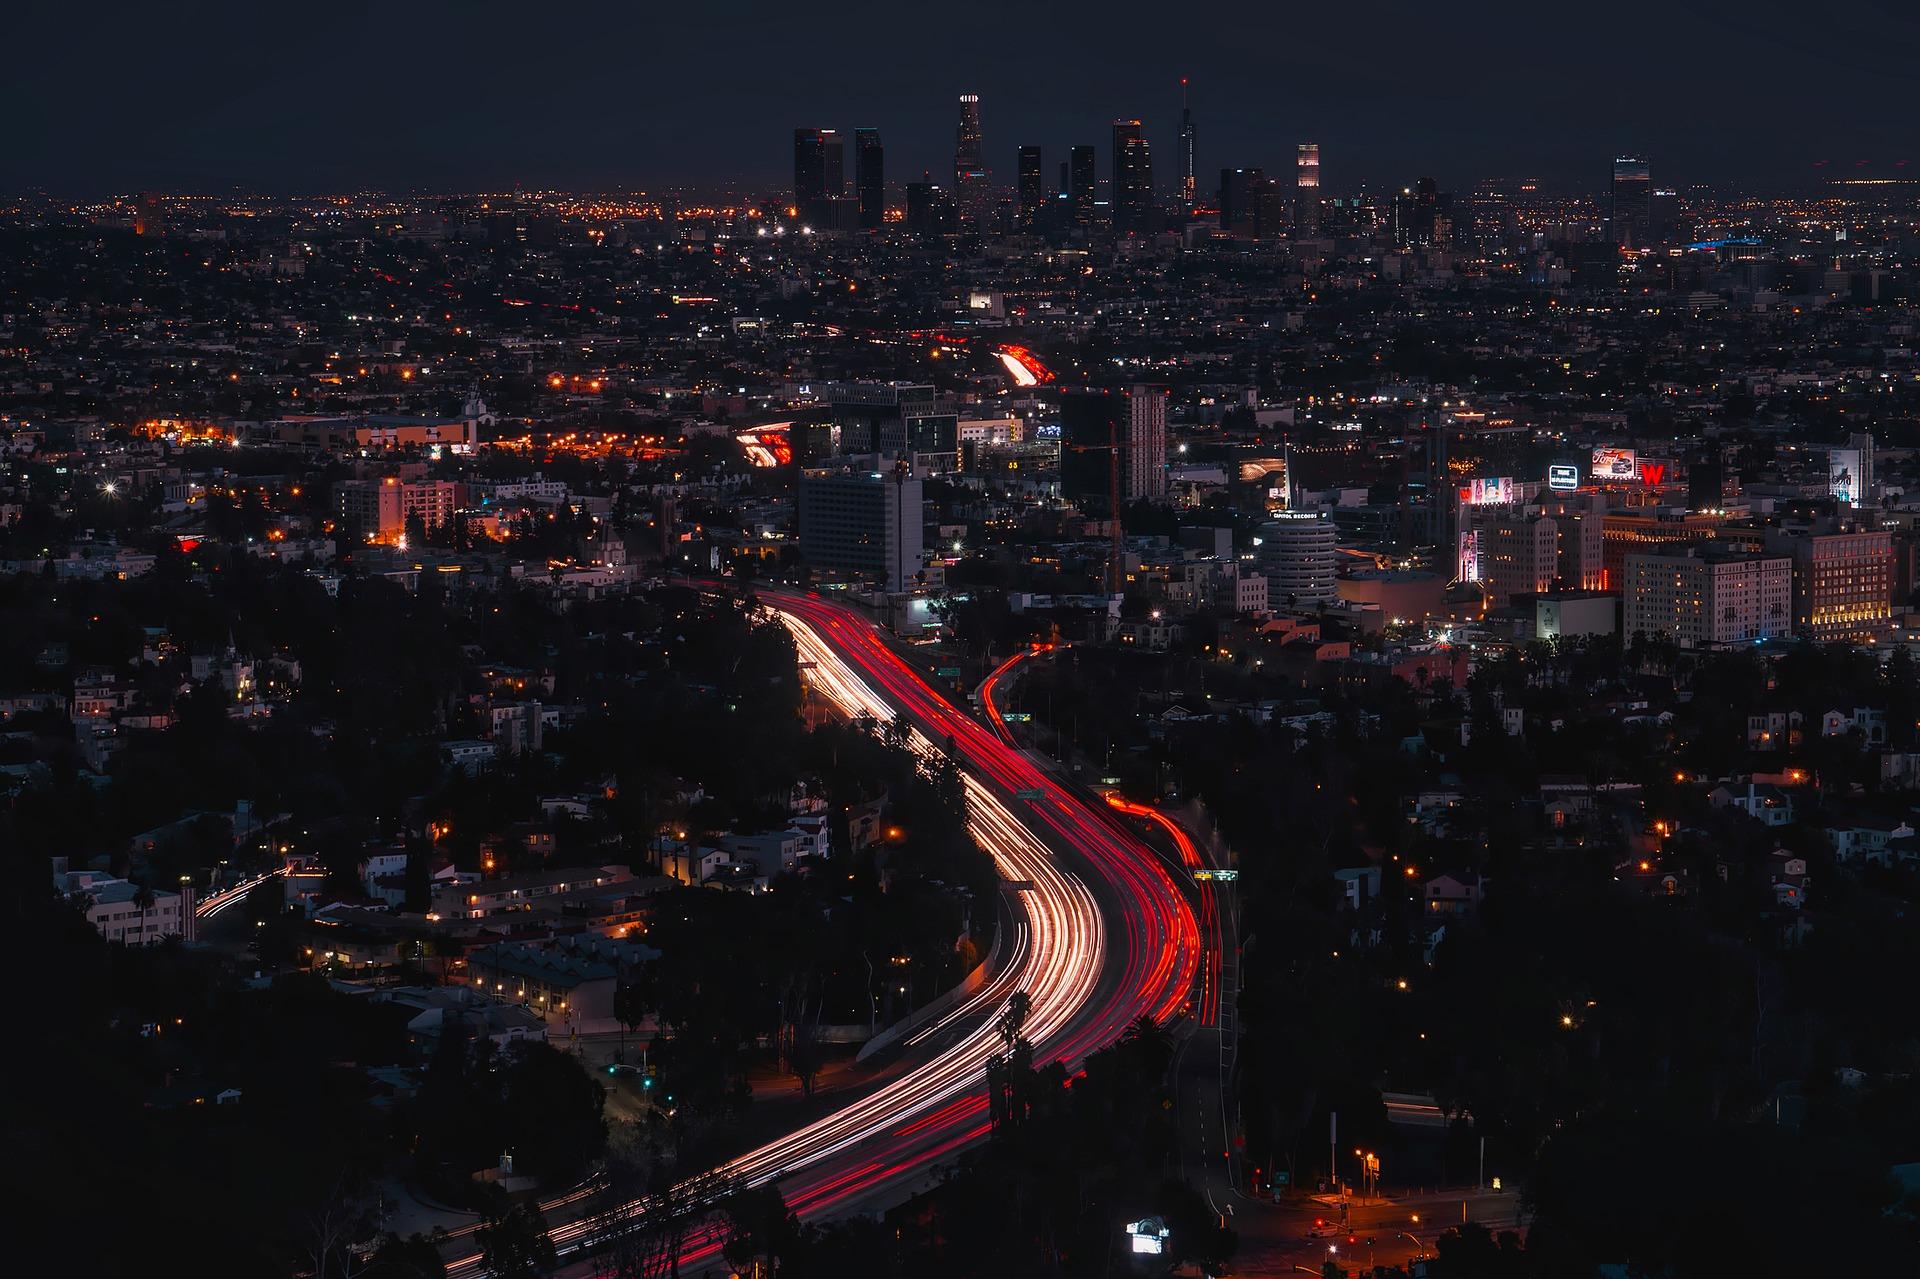 Los Angeles City / Traffic